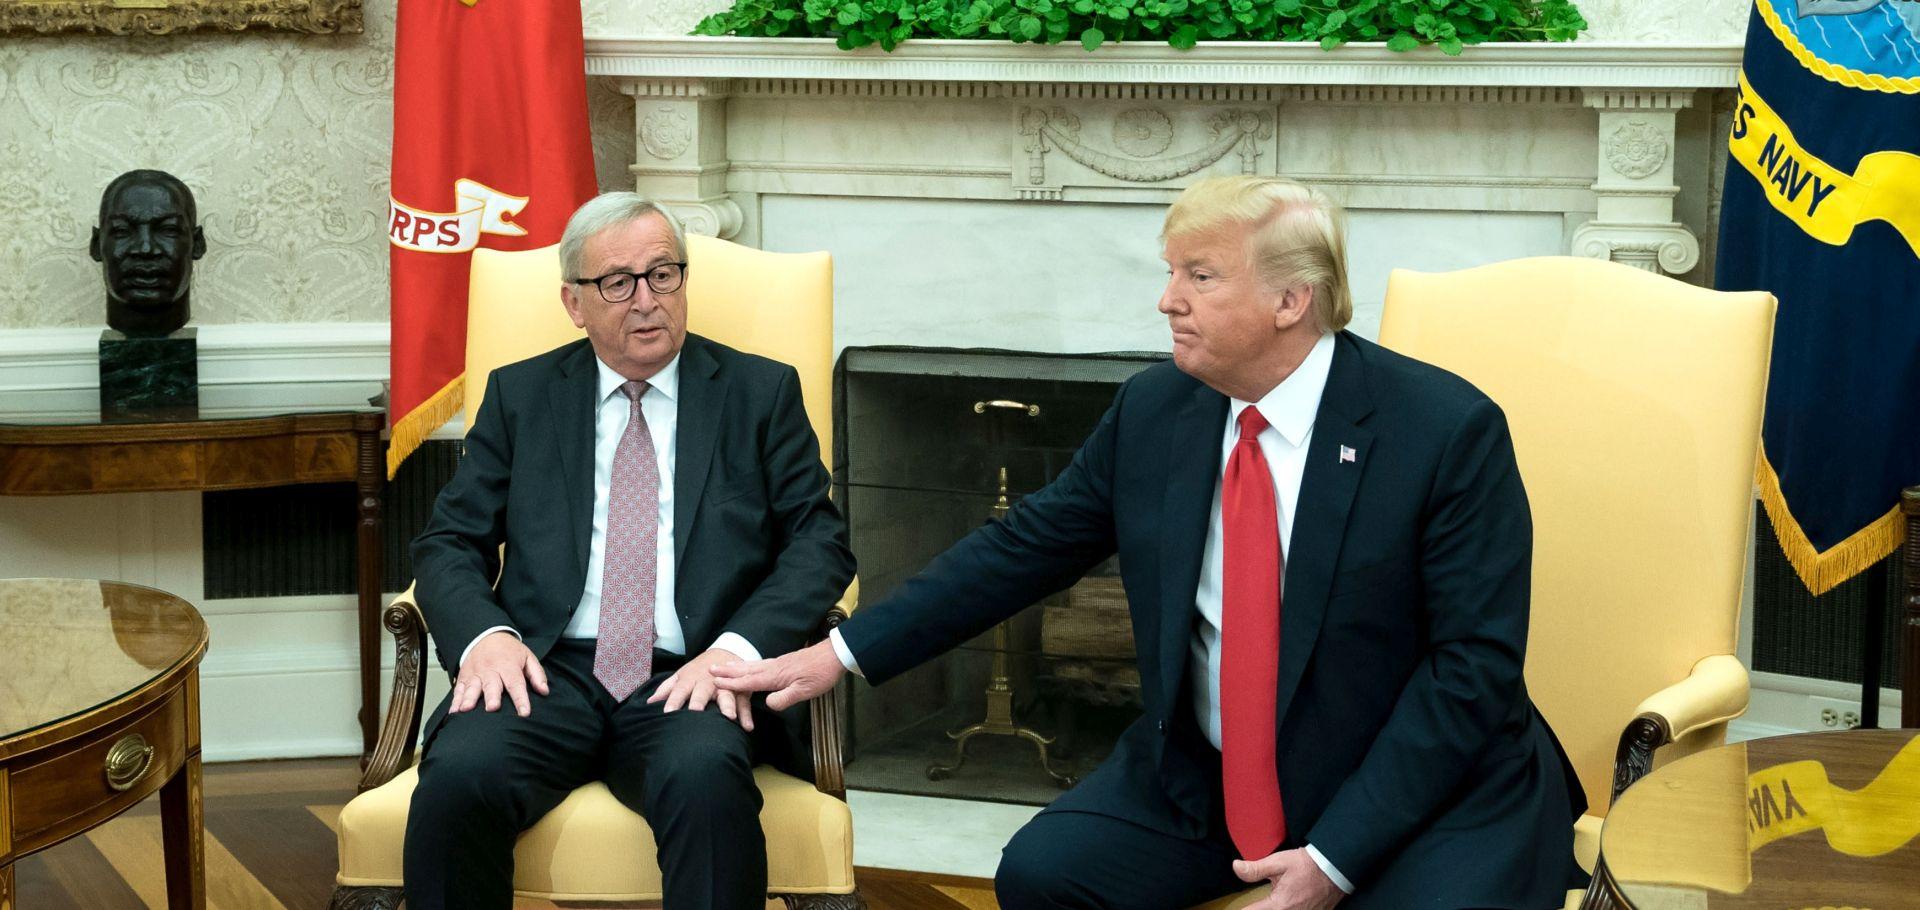 SAD i EU Trgovinsko primirje, pozornost prema Kini